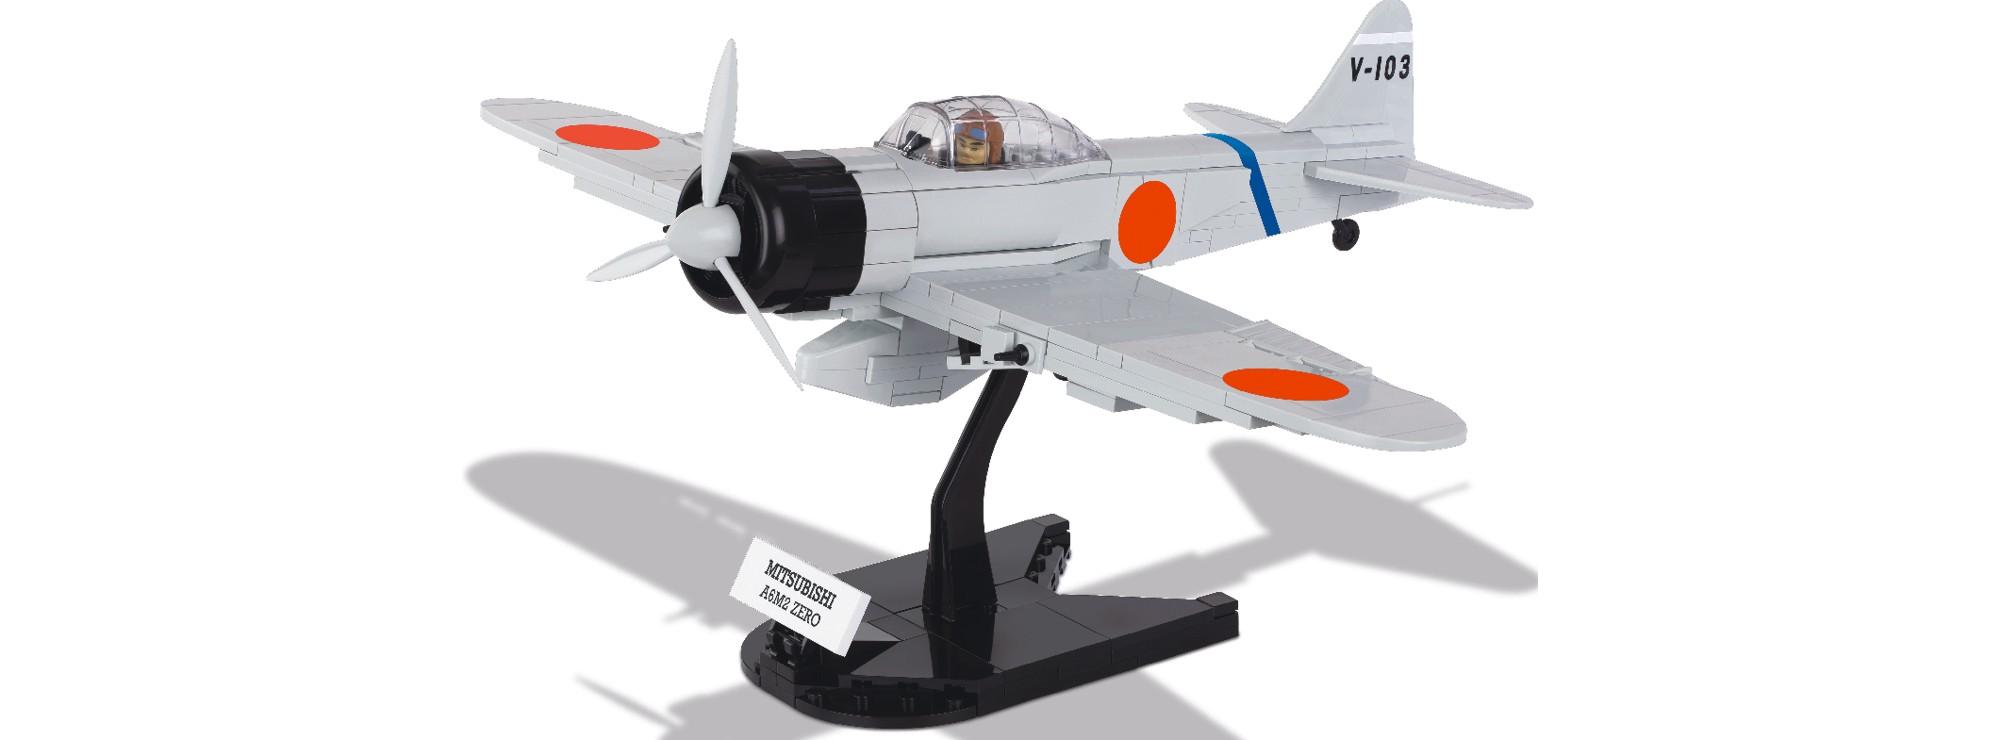 cobi 5515 mitsubishi a6m2 zero   flugzeug baukasten   online kaufen